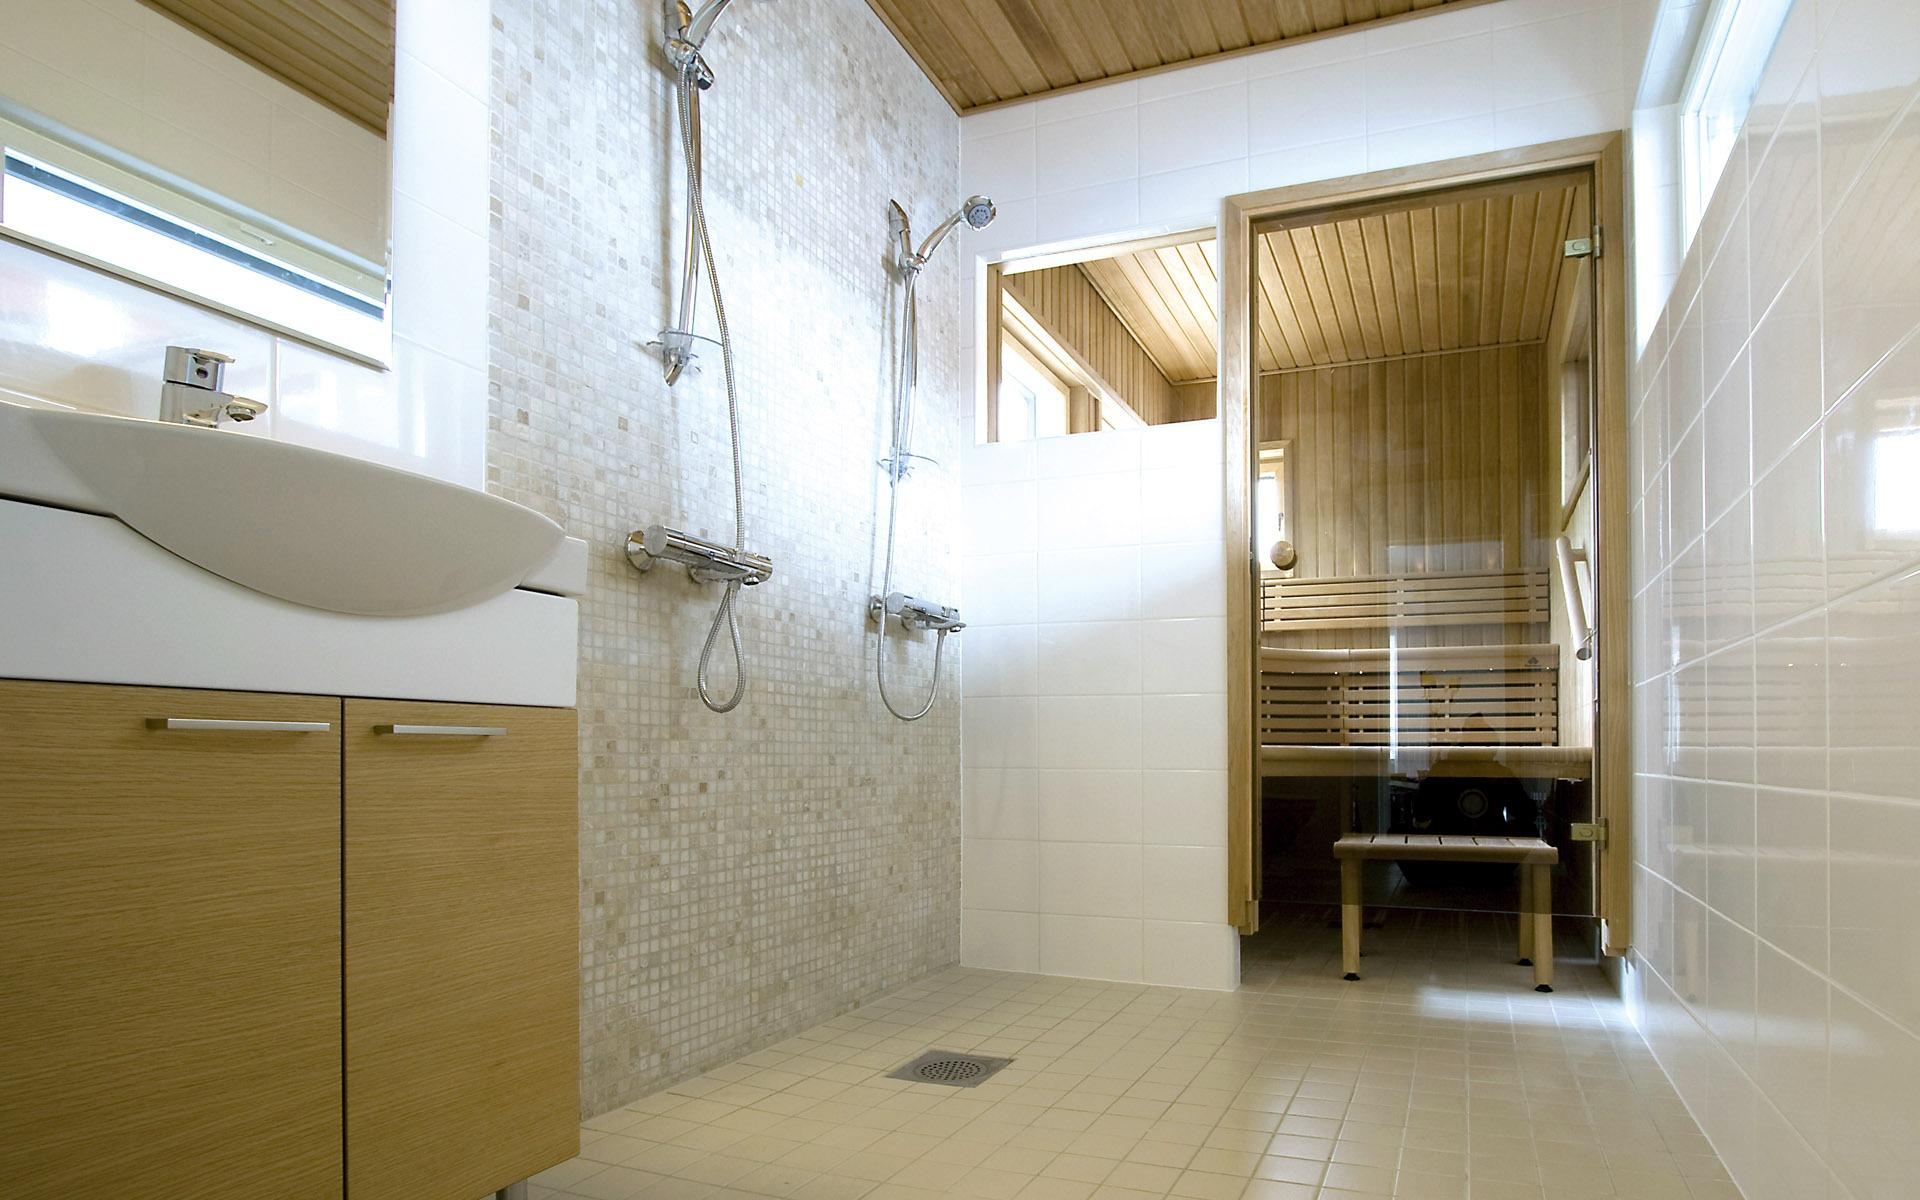 Fond d 39 cran photo salle de bain 2 8 1920x1200 fond d for Ecran salle de bain